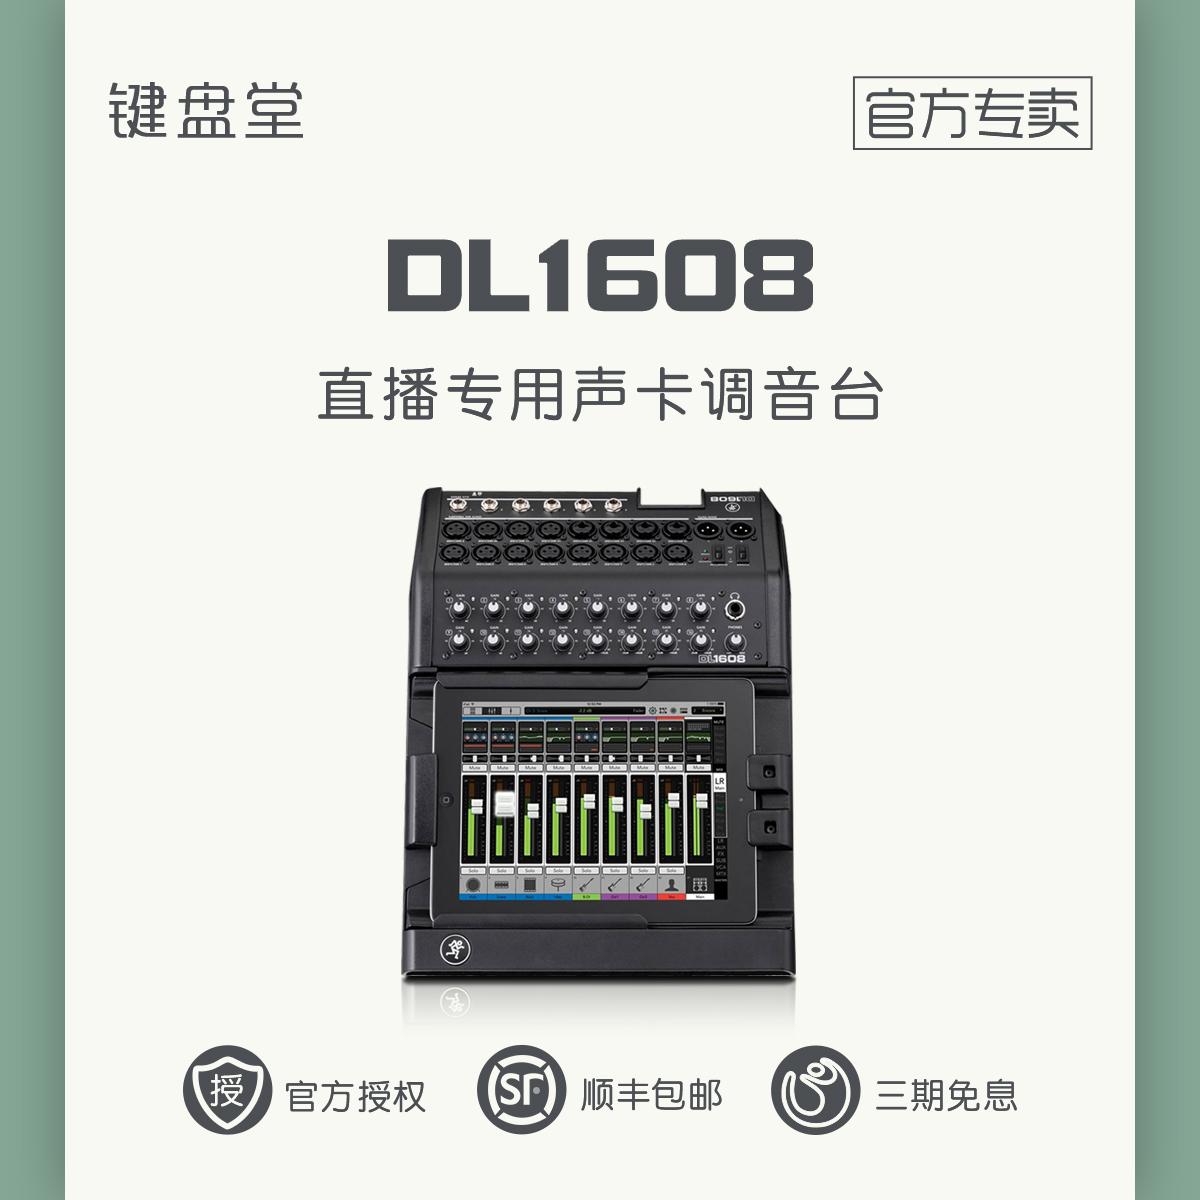 Runningman Mackie/美奇美技 DL1608 数字调音台正品